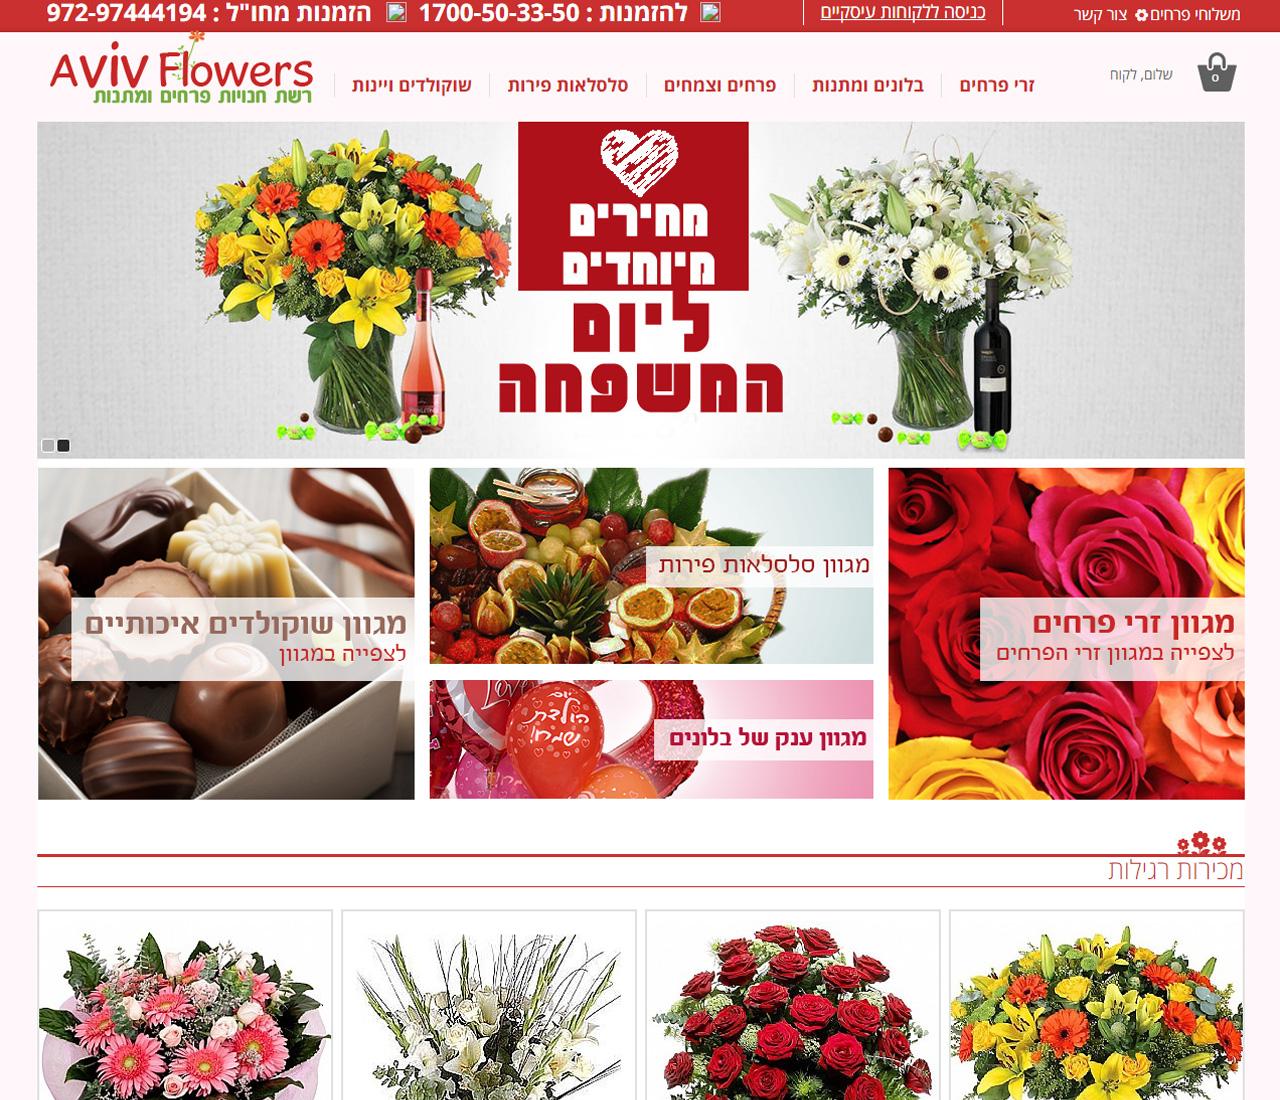 Avivflowers